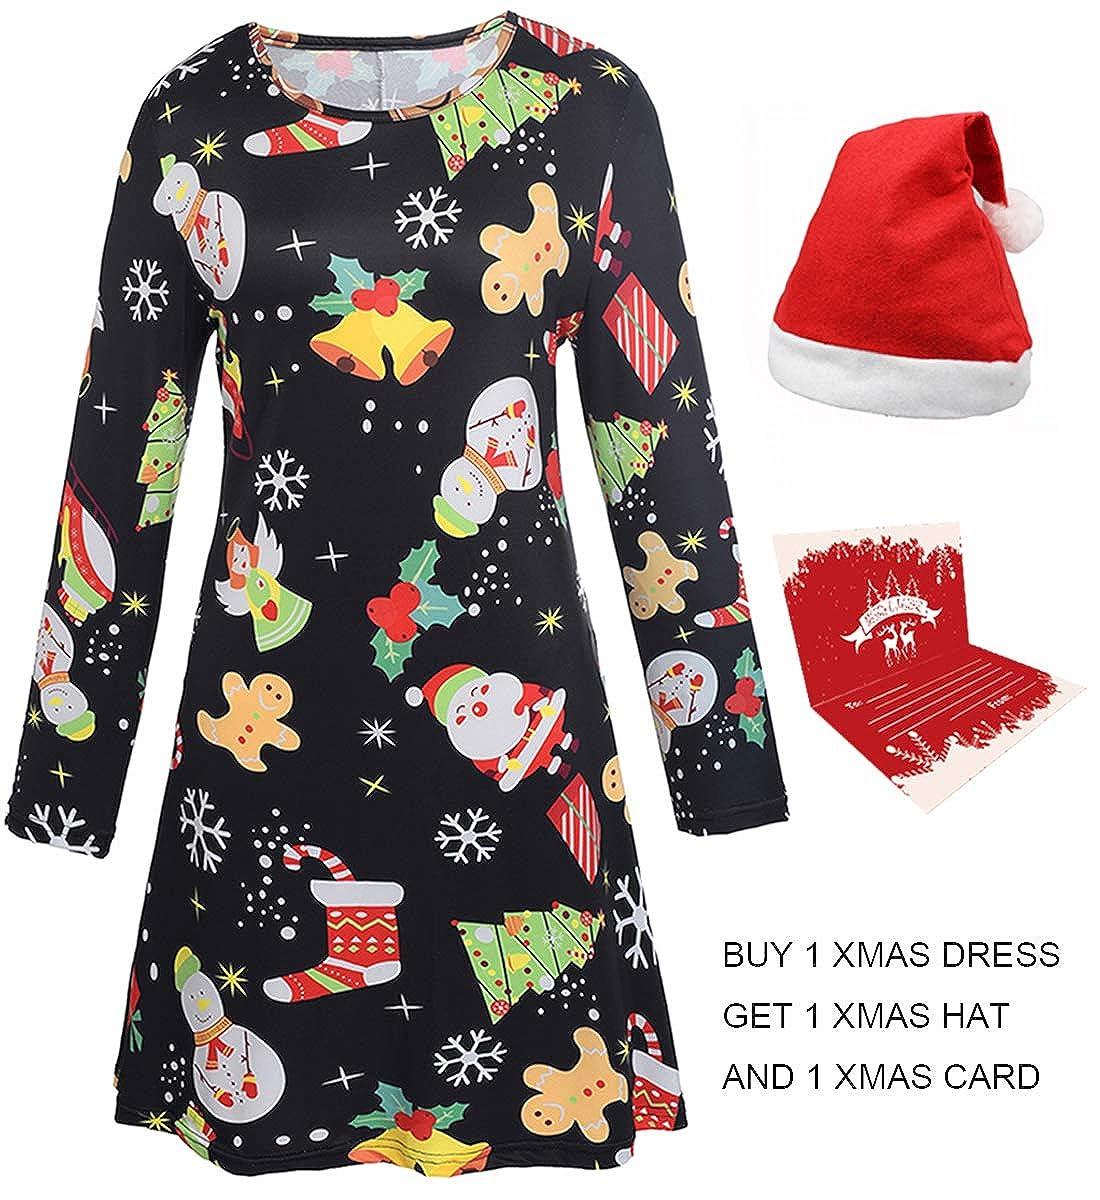 Youthwell Christmas Dress, Women Santa Snowman Print Long Sleeve Swing Dress MAS0001-04